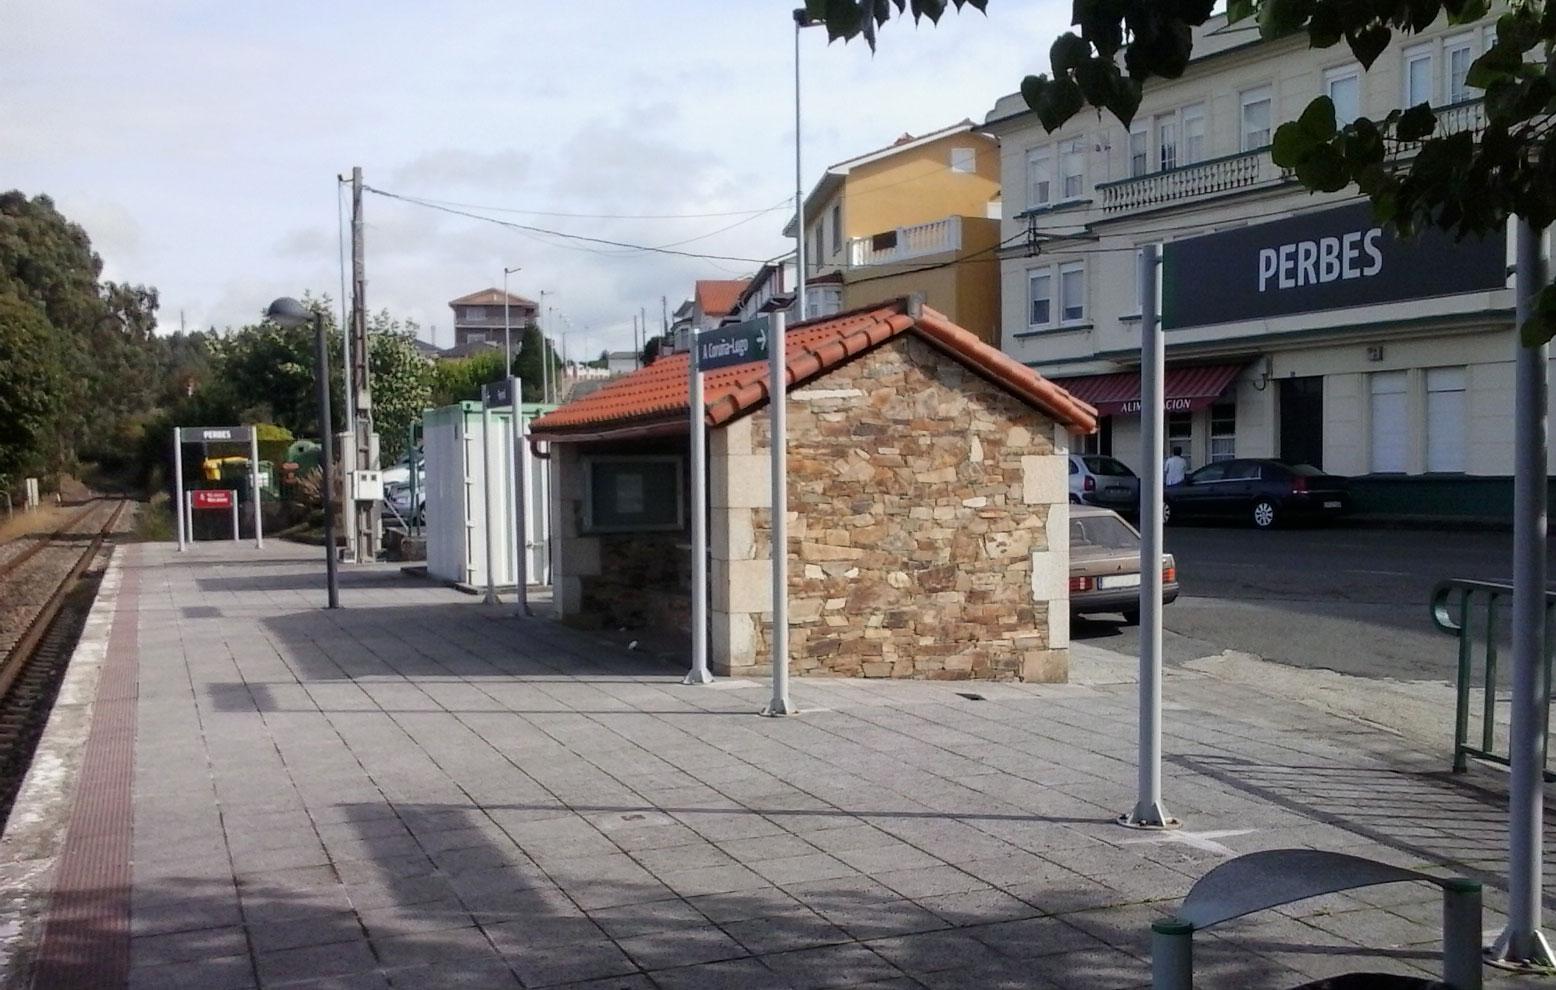 Estación de Perbes